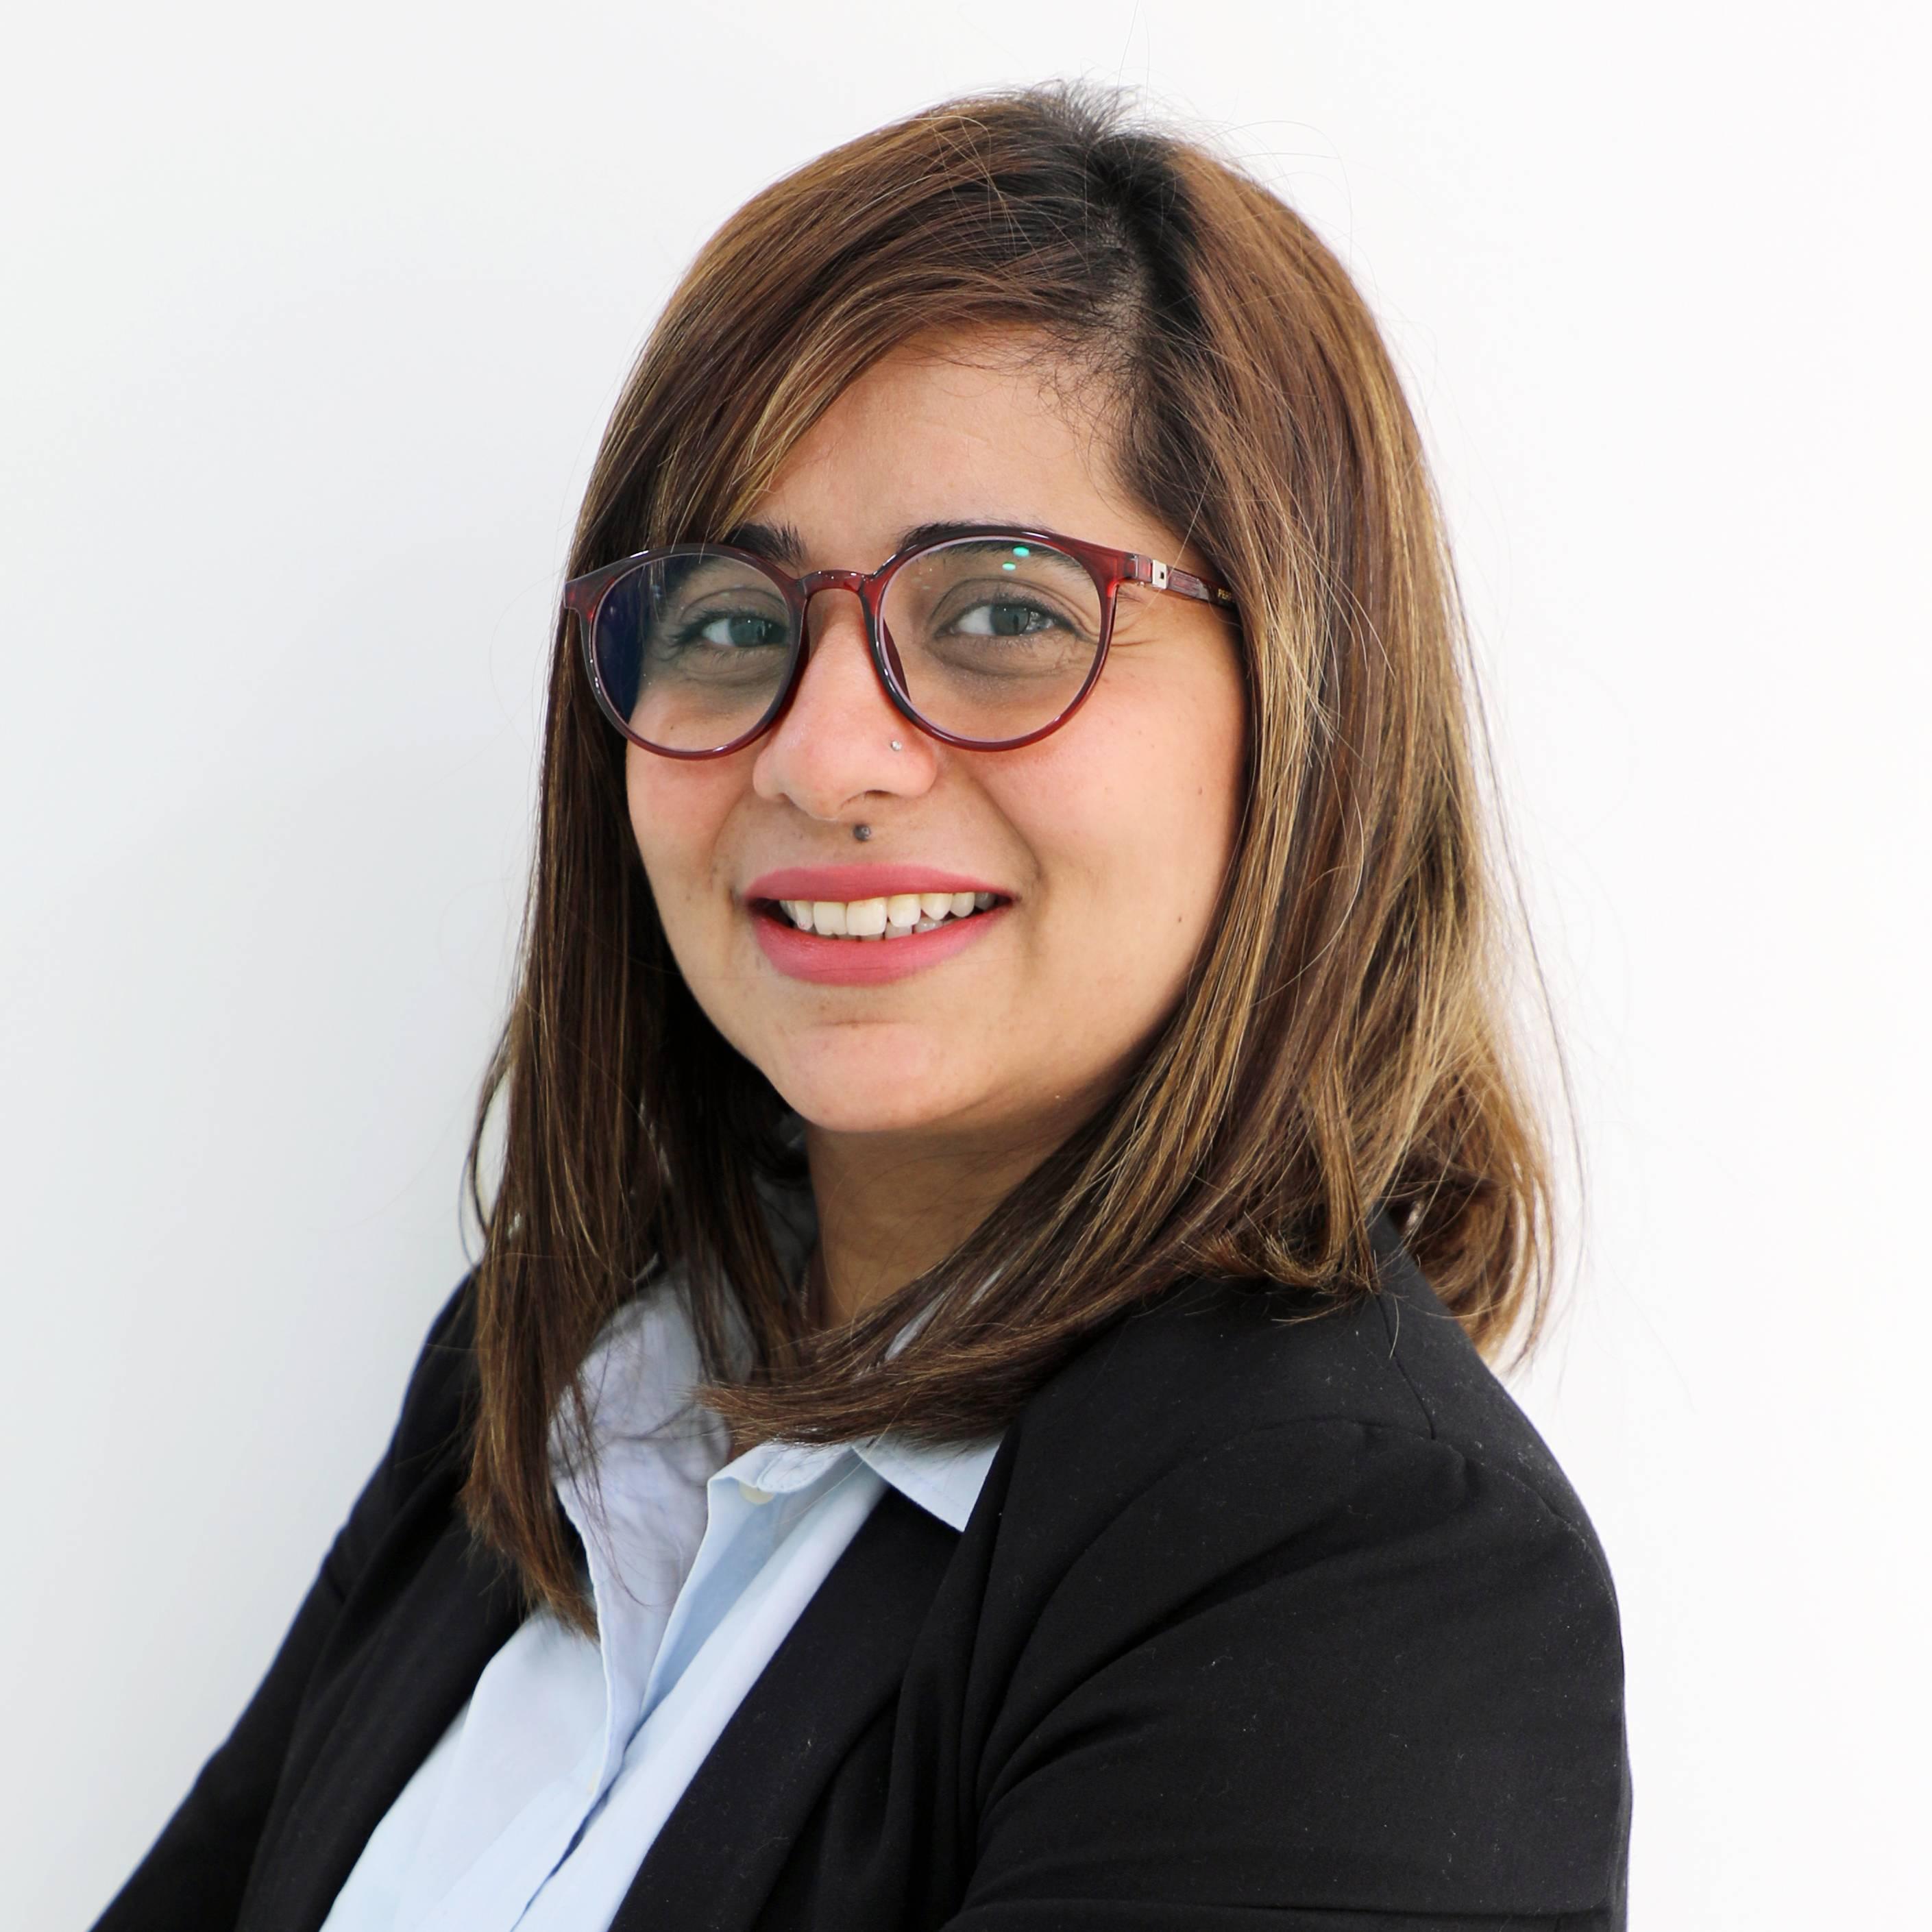 Maria Habib